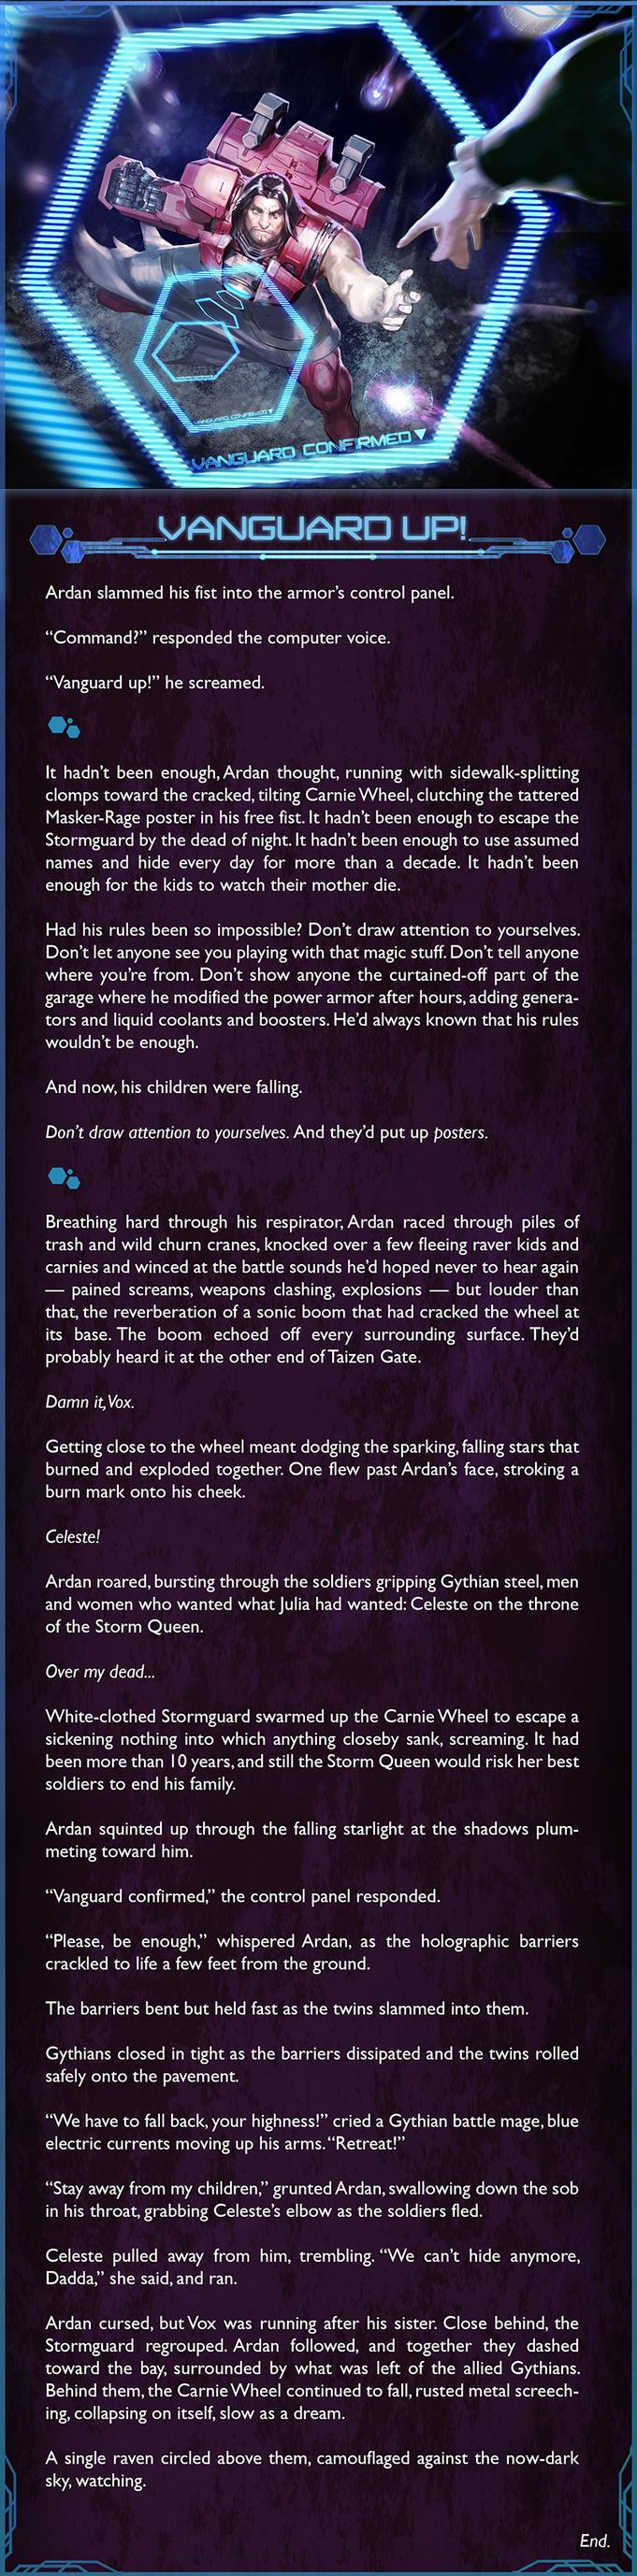 Ardan third lore